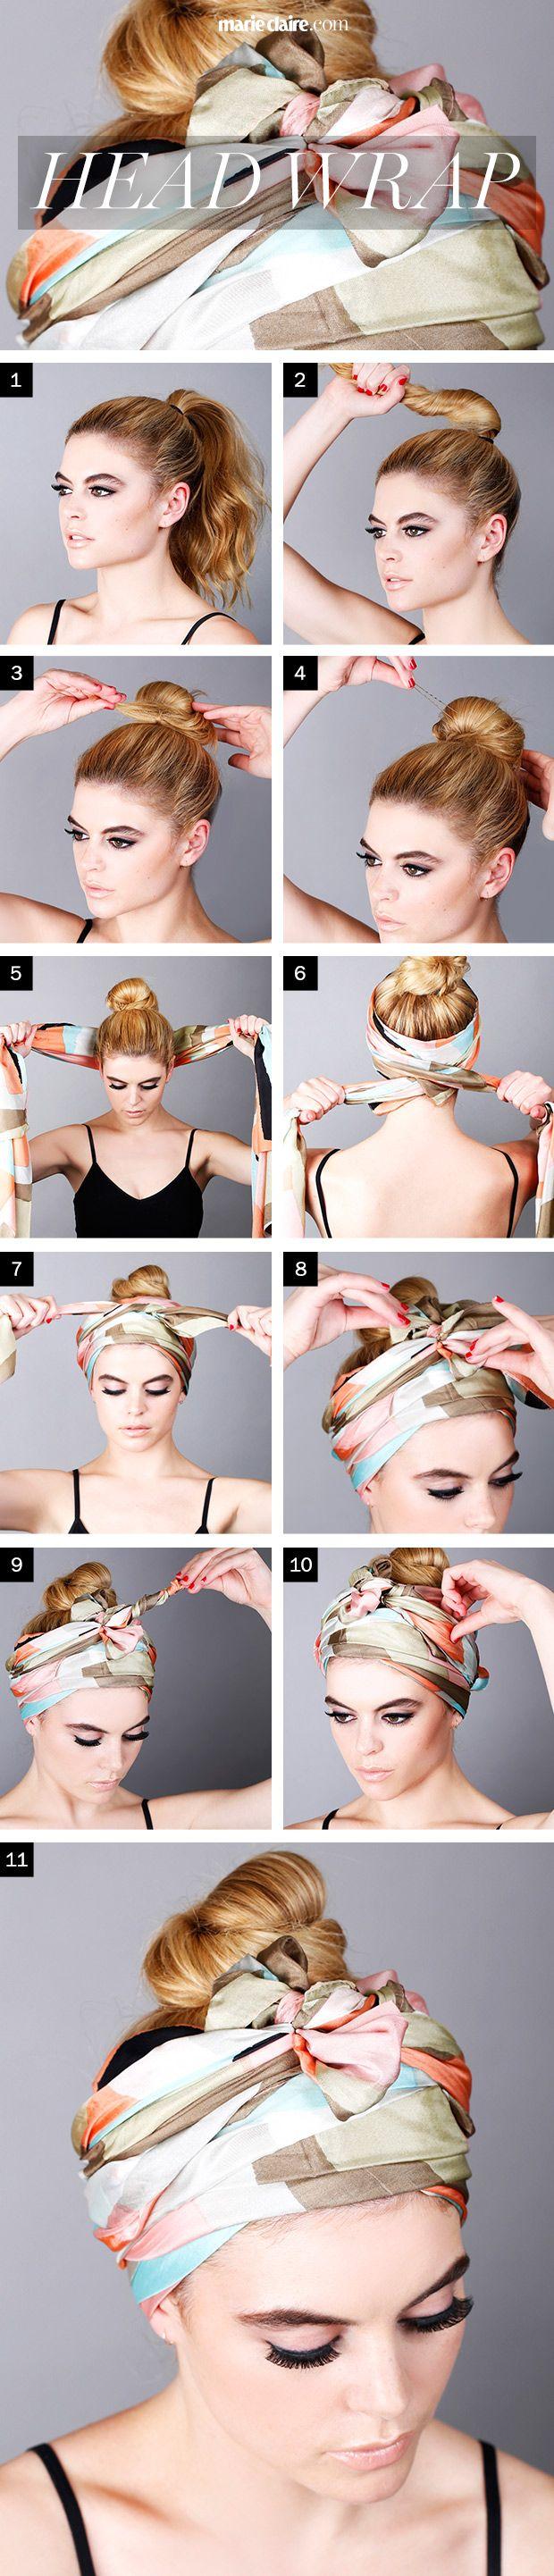 comment porter foulard en bandeau